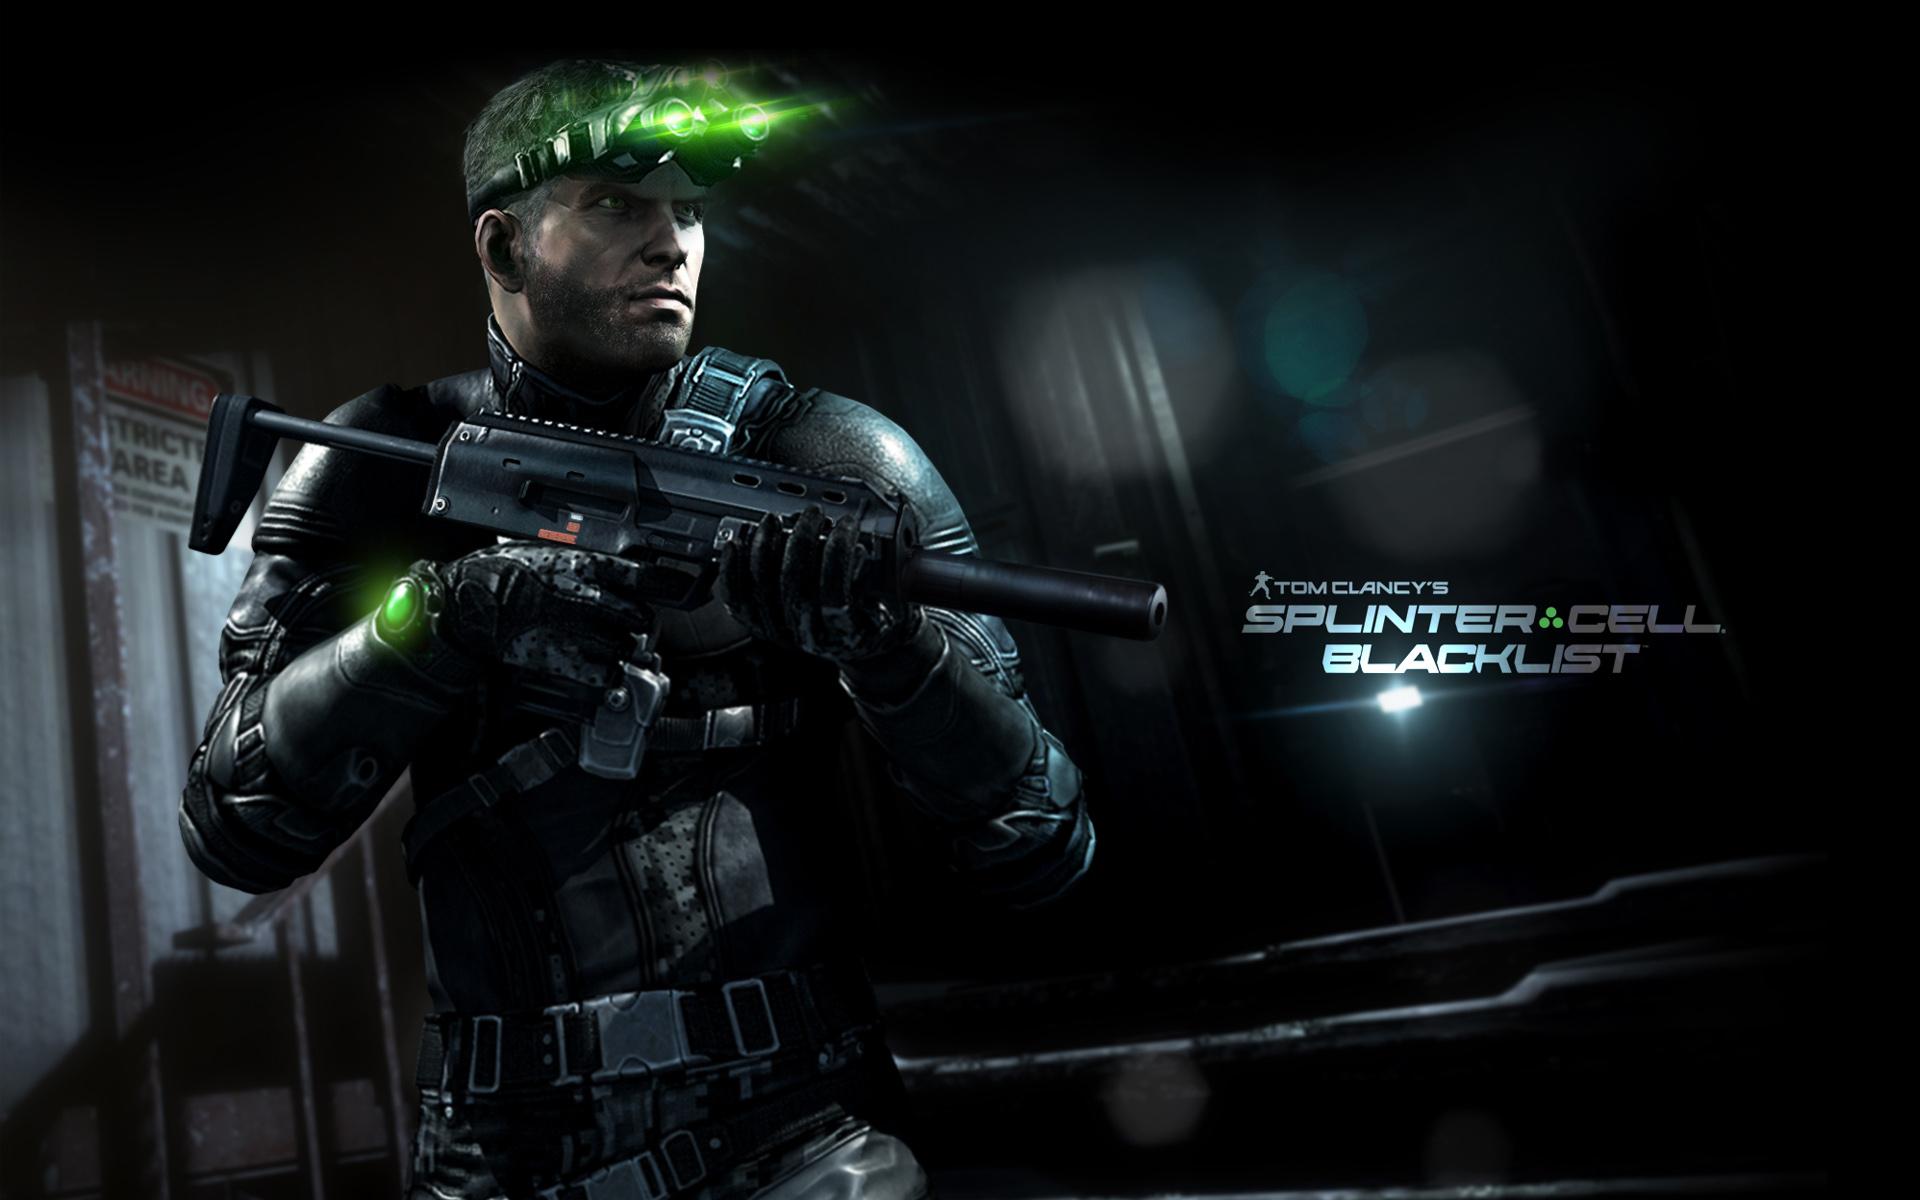 HD Wallpapers Splinter Cell Blacklist